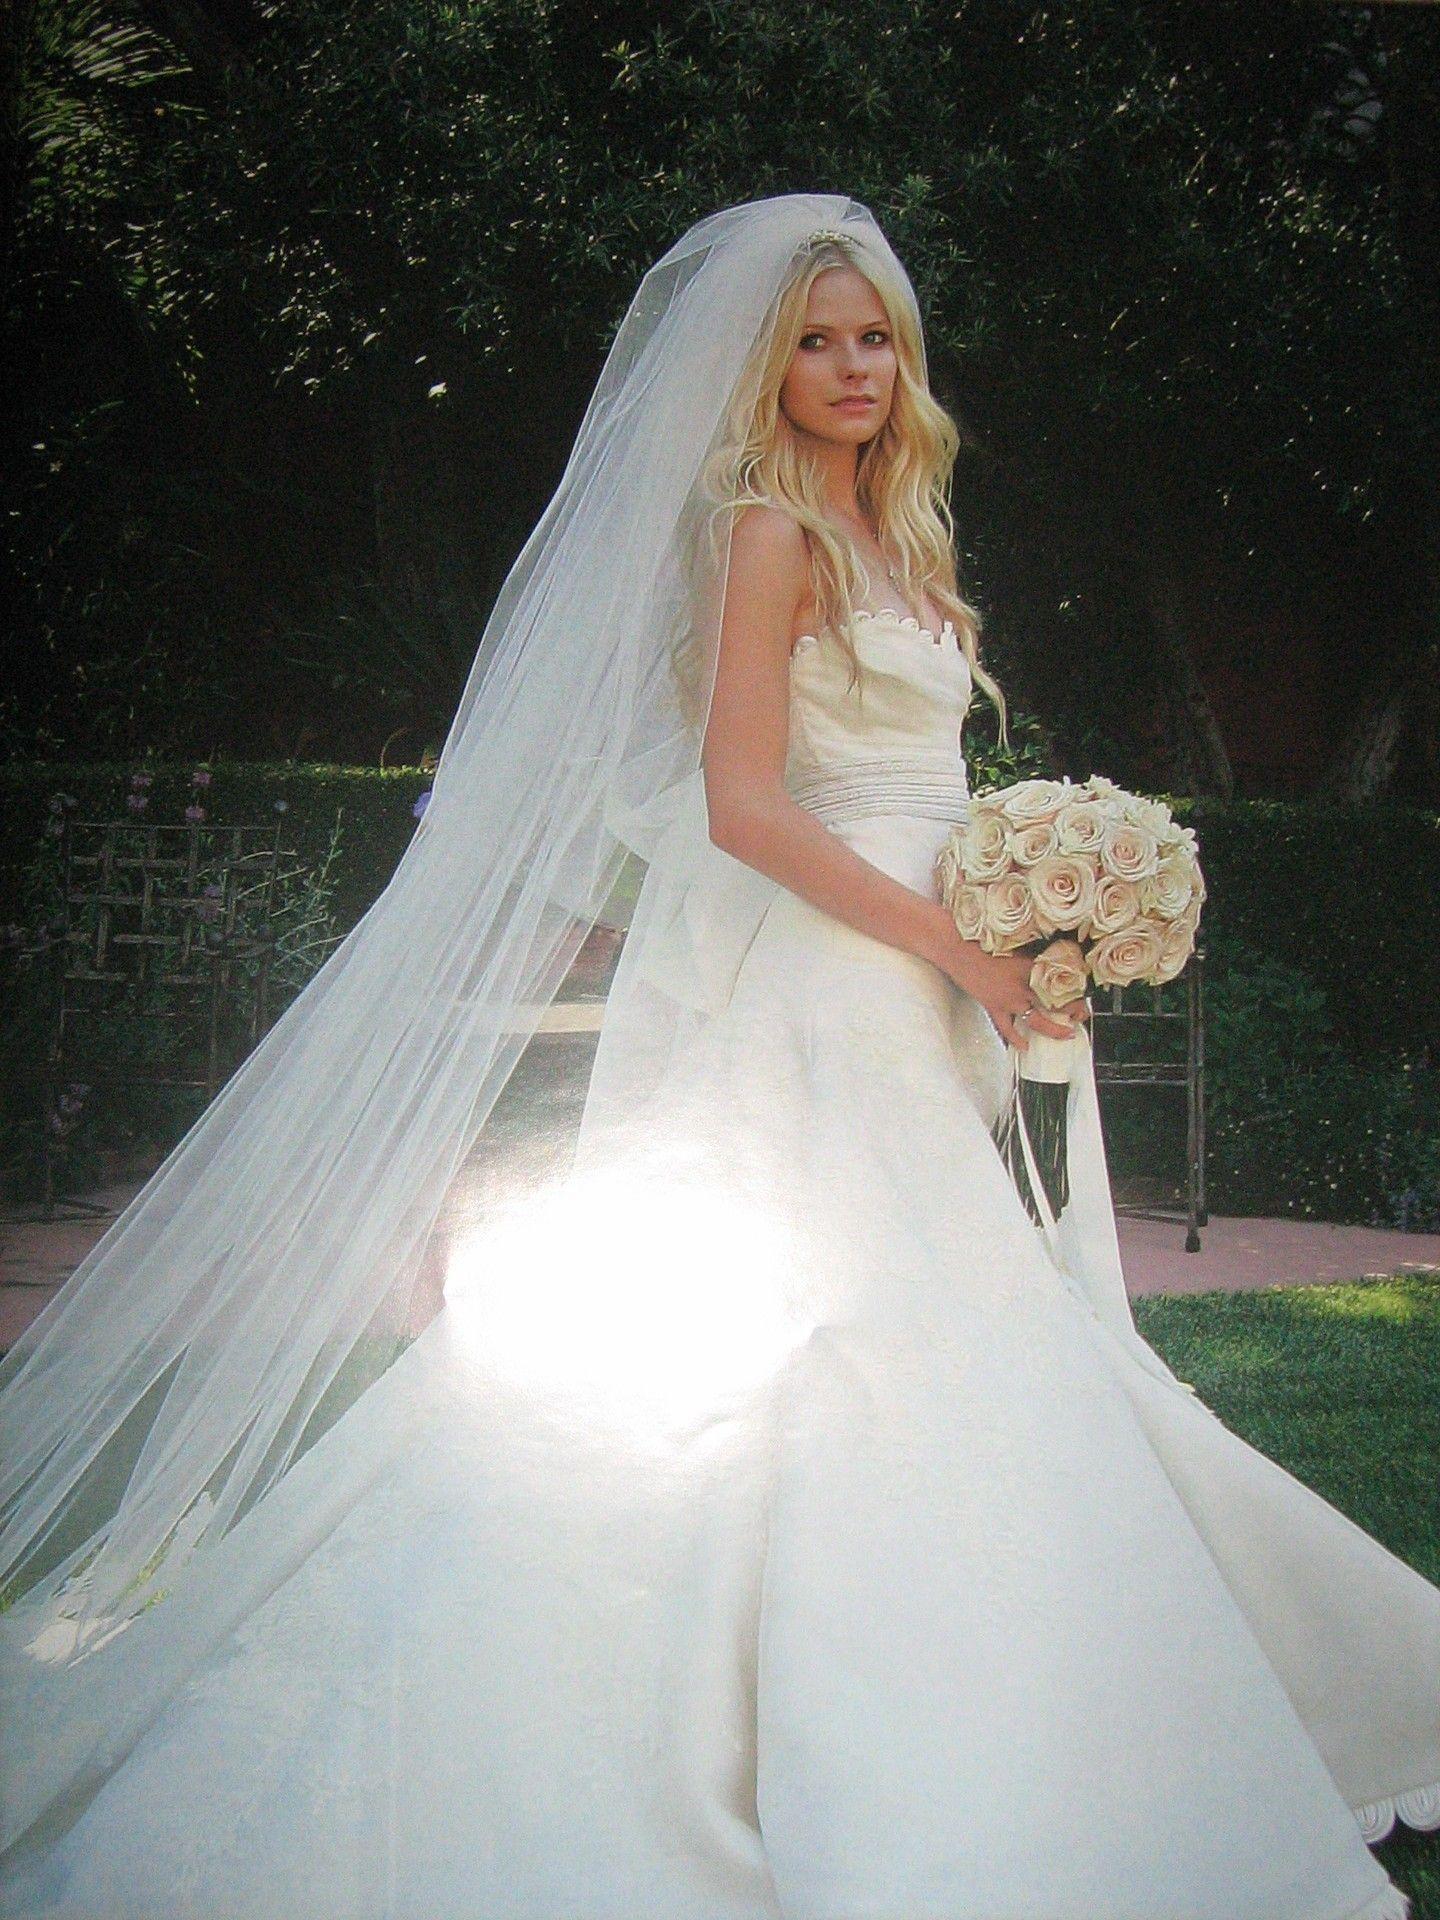 Avril Lavigne Wedding Dress Wedding Dresses Long White Wedding Dress Avril Lavigne Bikini